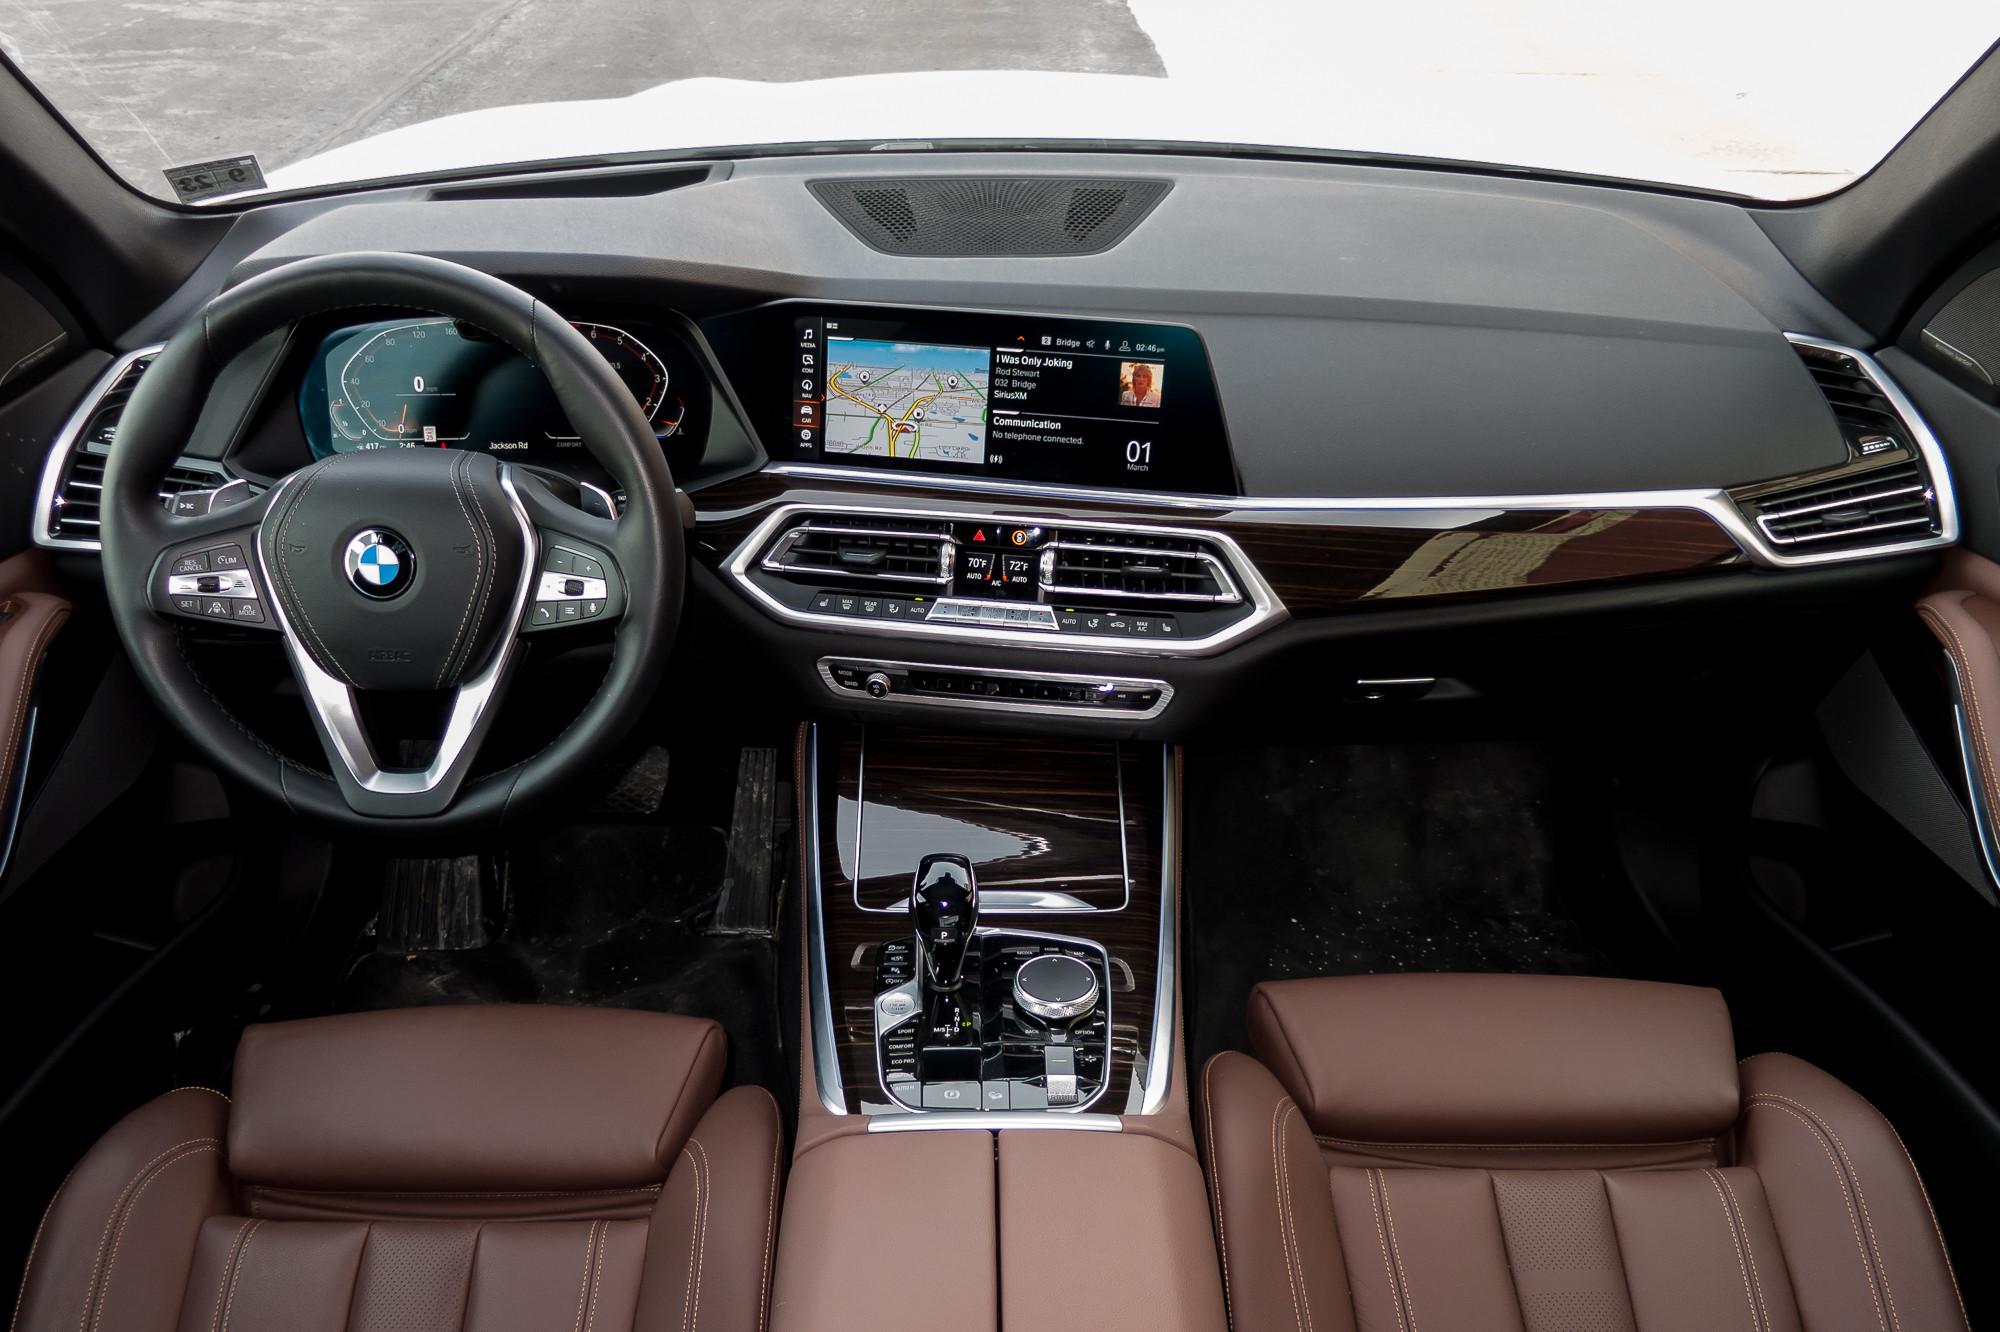 2019 Bmw X5 Review Excellent Suv Iffy Bmw News Cars Com